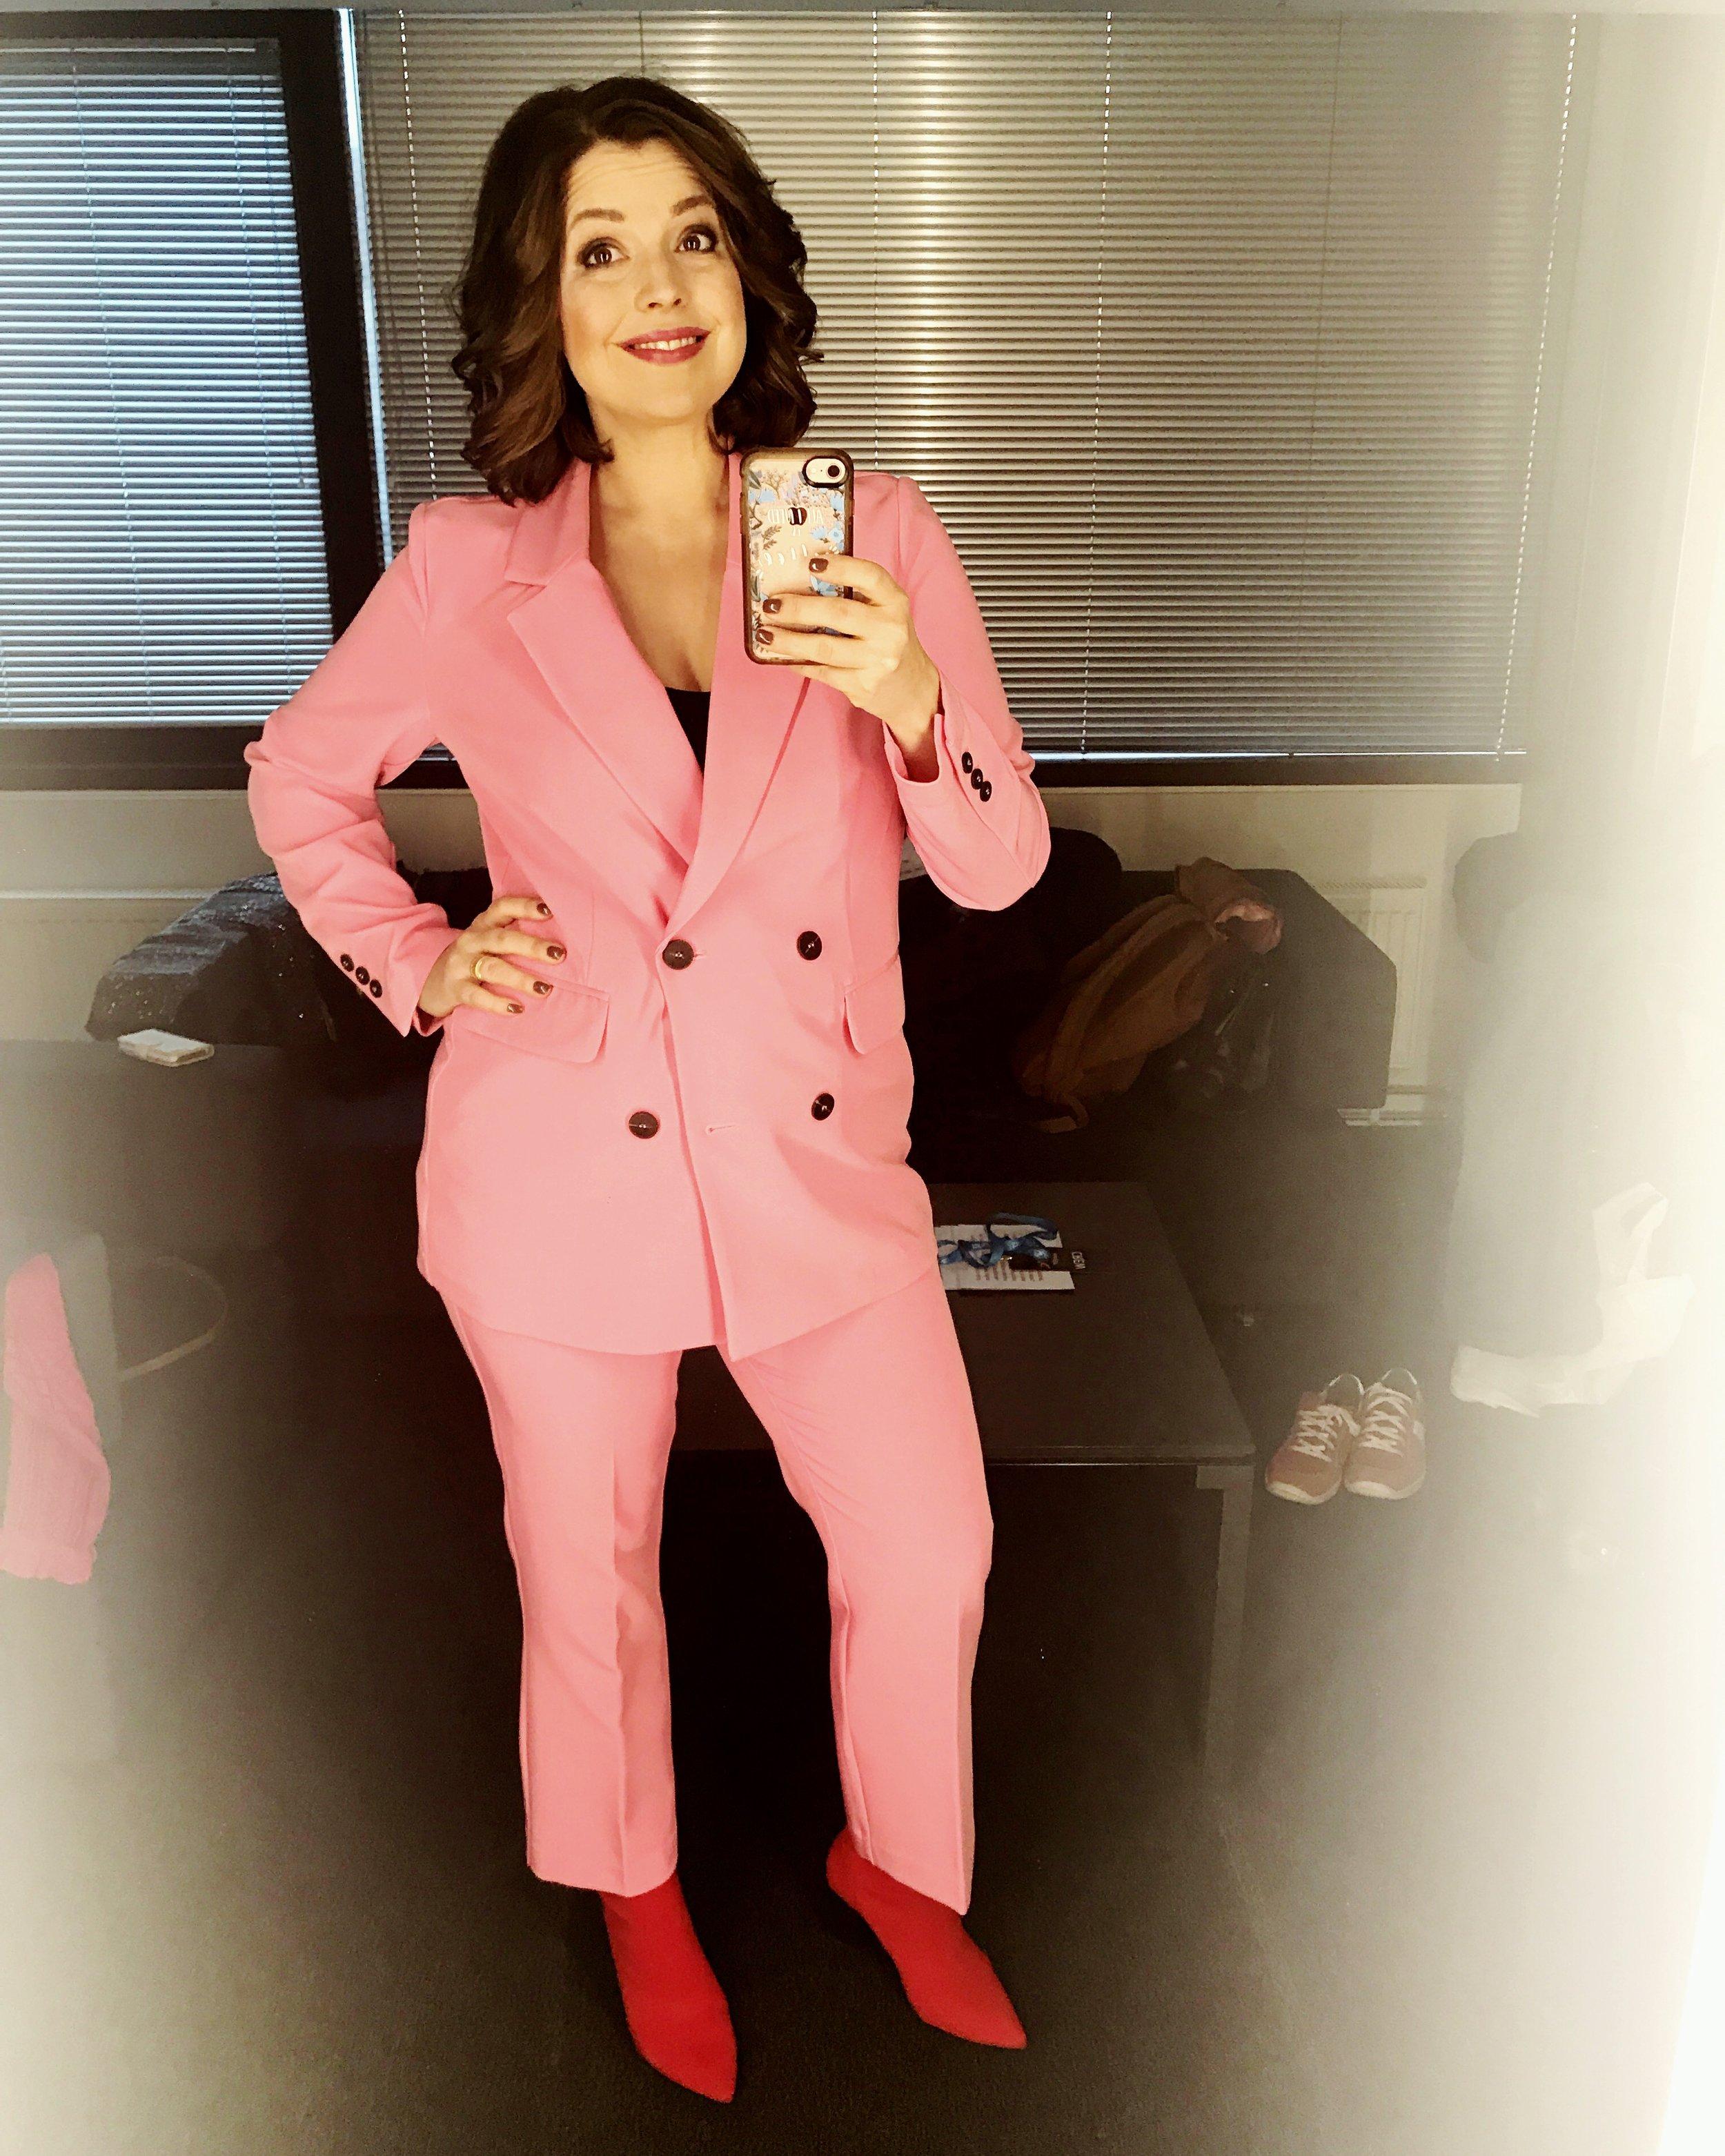 Eurovisions-Eva har rosa kostym.